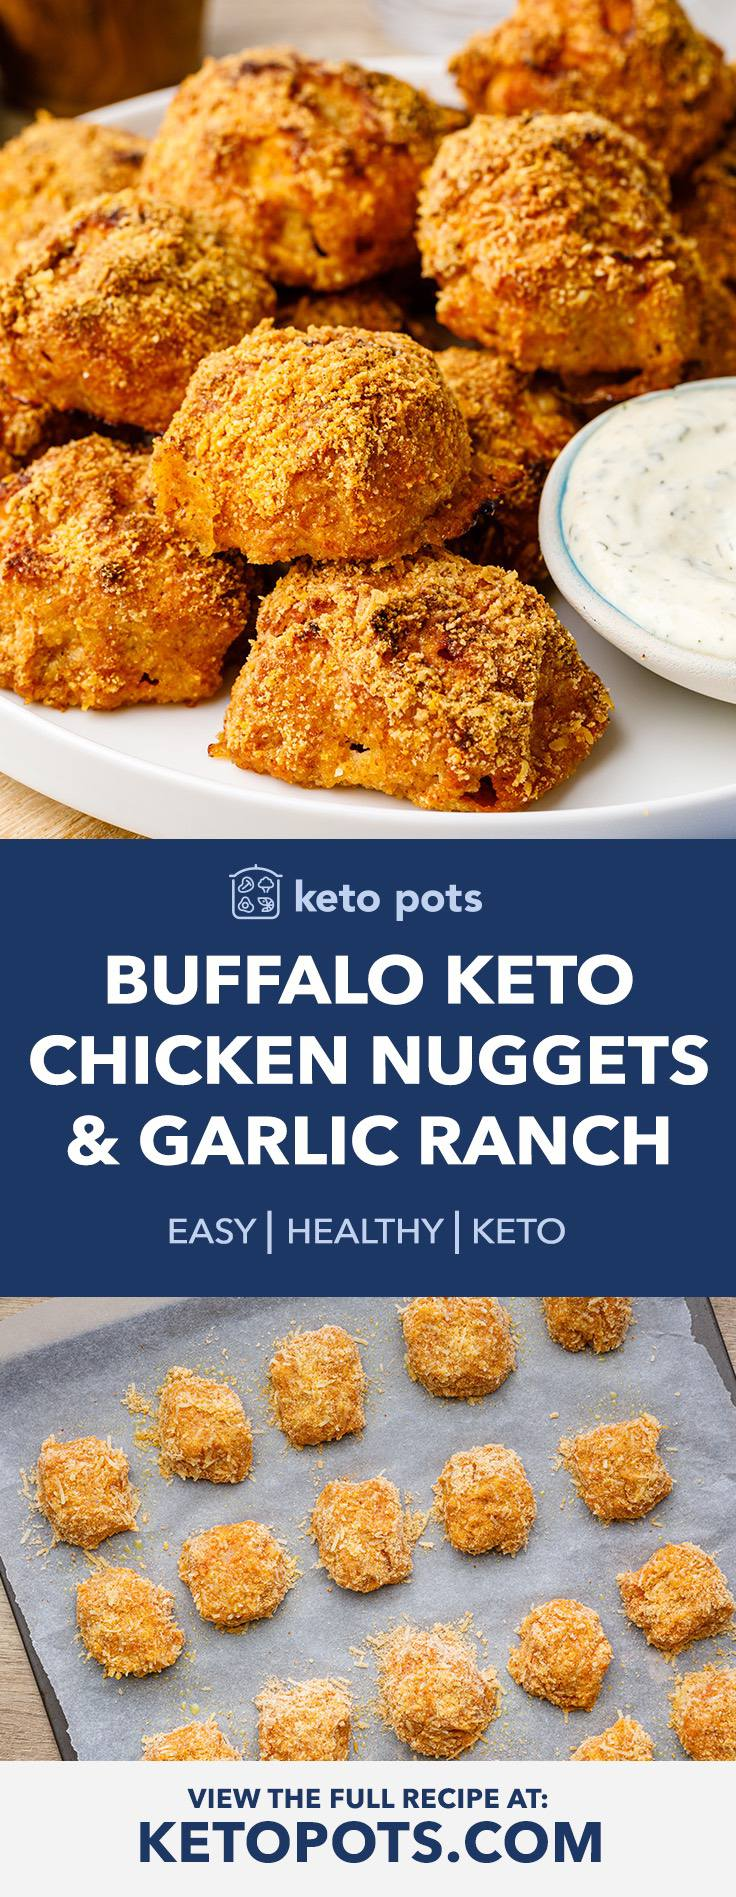 Buffalo Keto Chicken Nuggets with Homemade Garlic Ranch